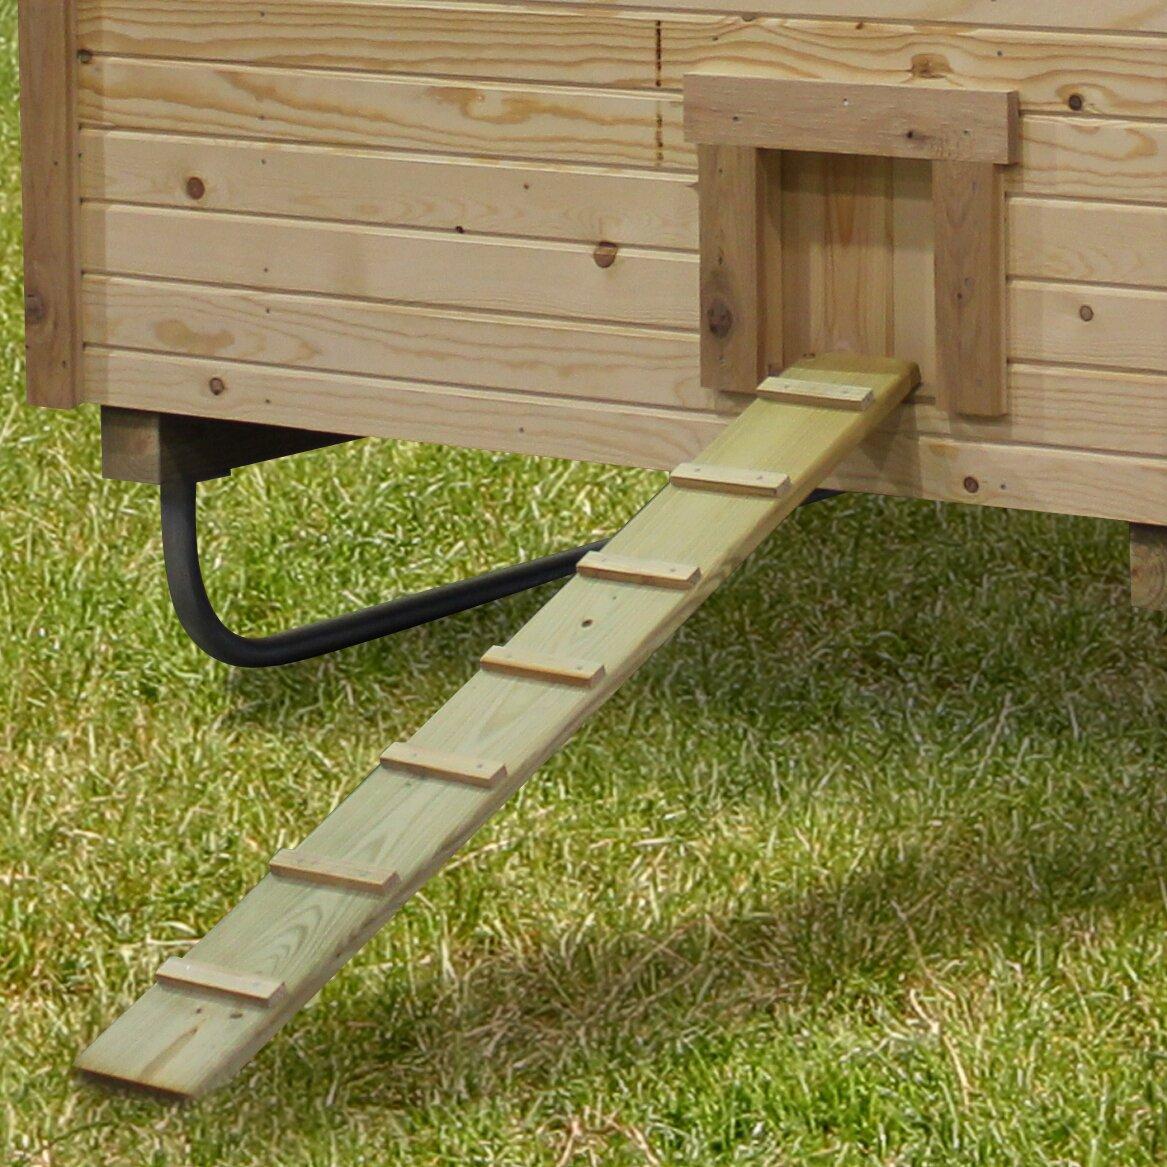 Alpine structures 4x6 ez fit chicken coop wayfair for 4x6 chicken coop